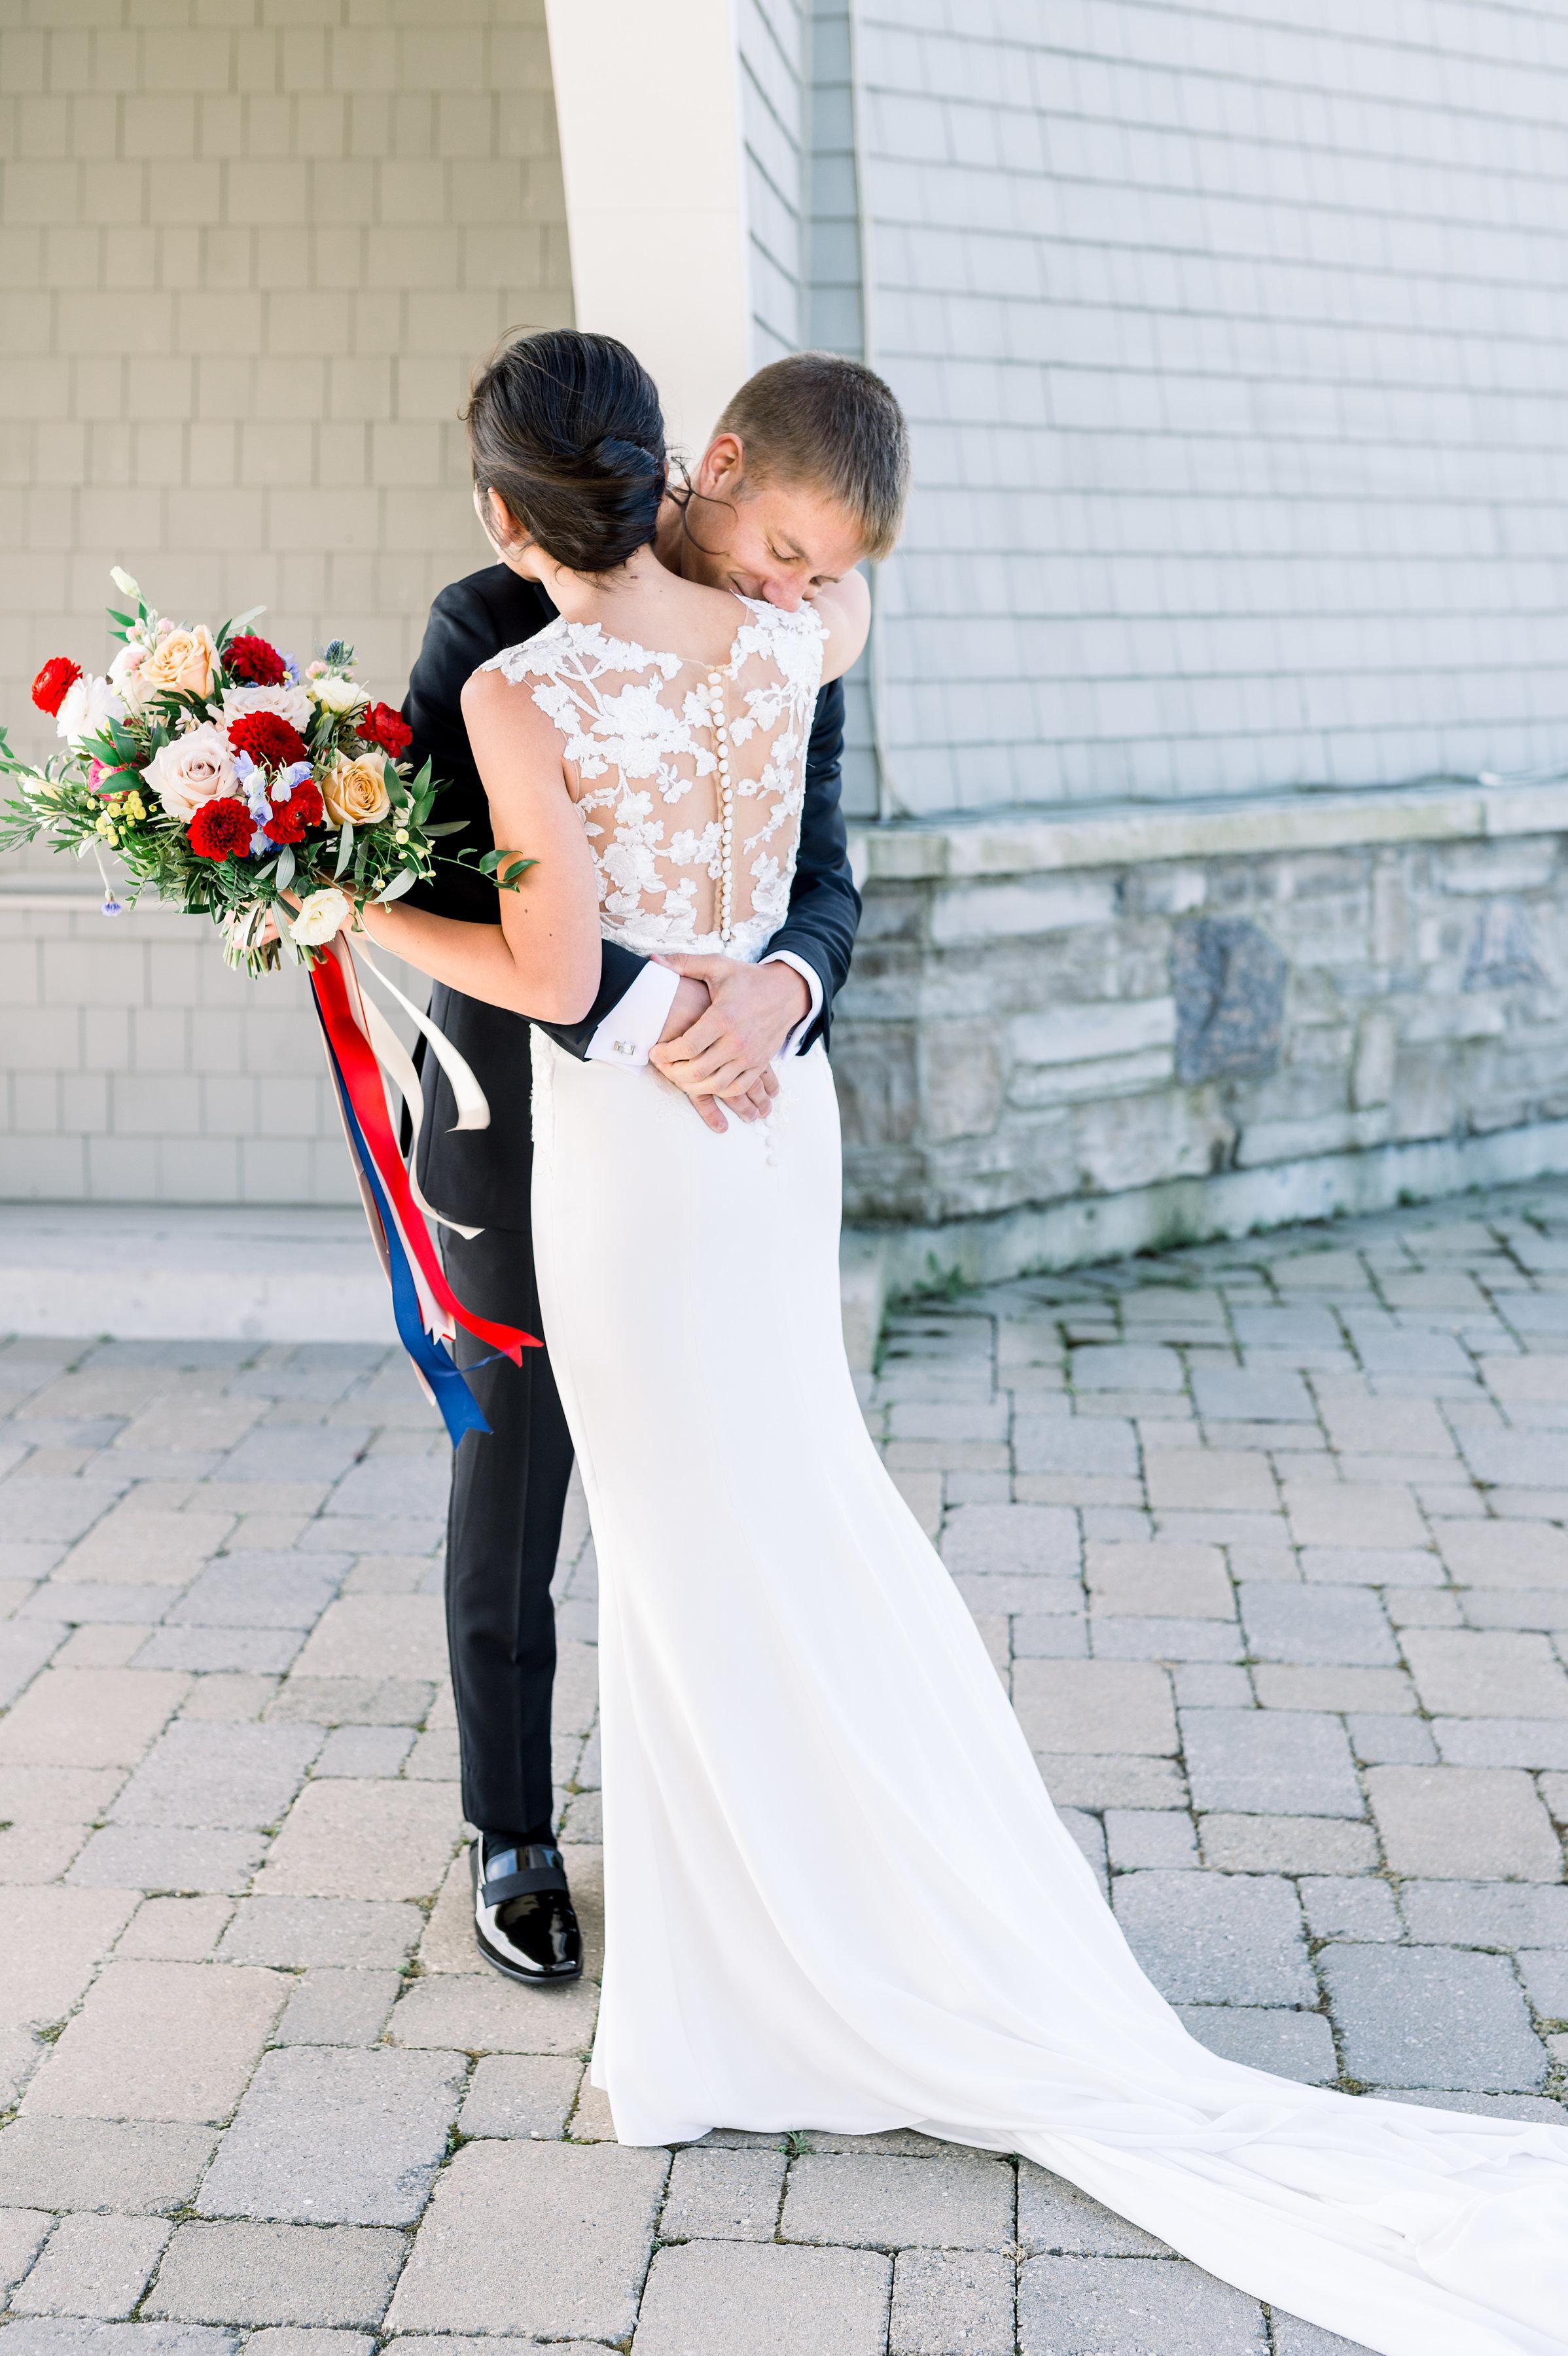 Mamiko-Aaron-Wedding-Whitney-Heard-Photography-5056.jpg